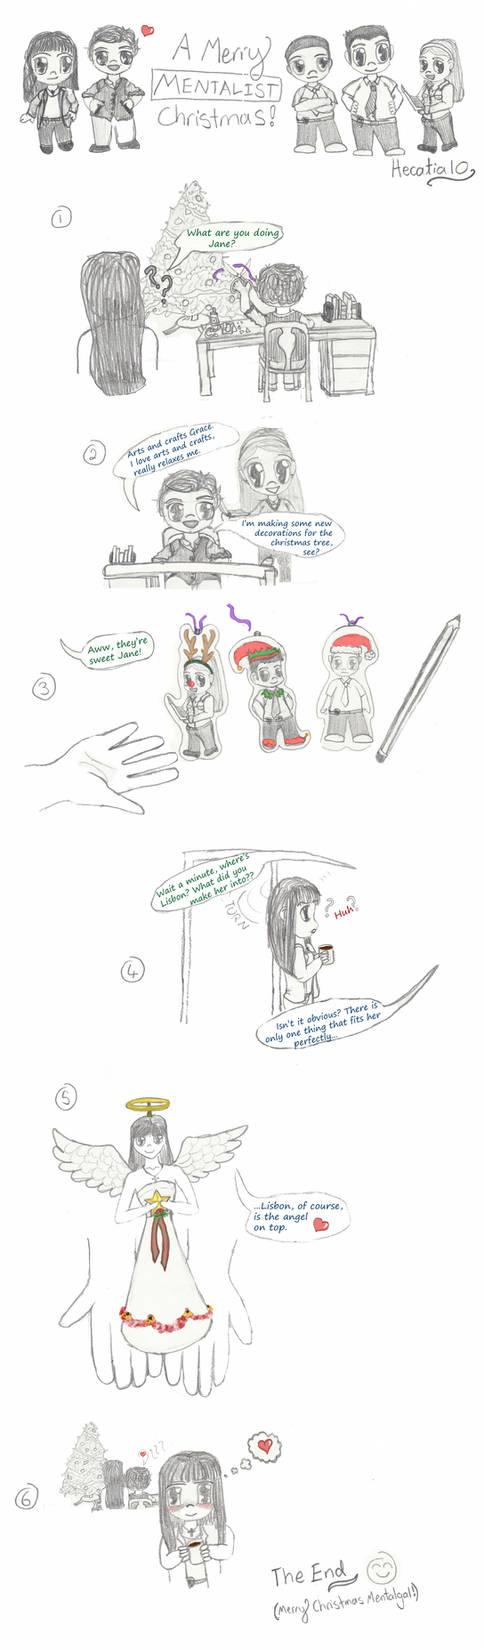 A Merry Mentalist Christmas - Secret Santa